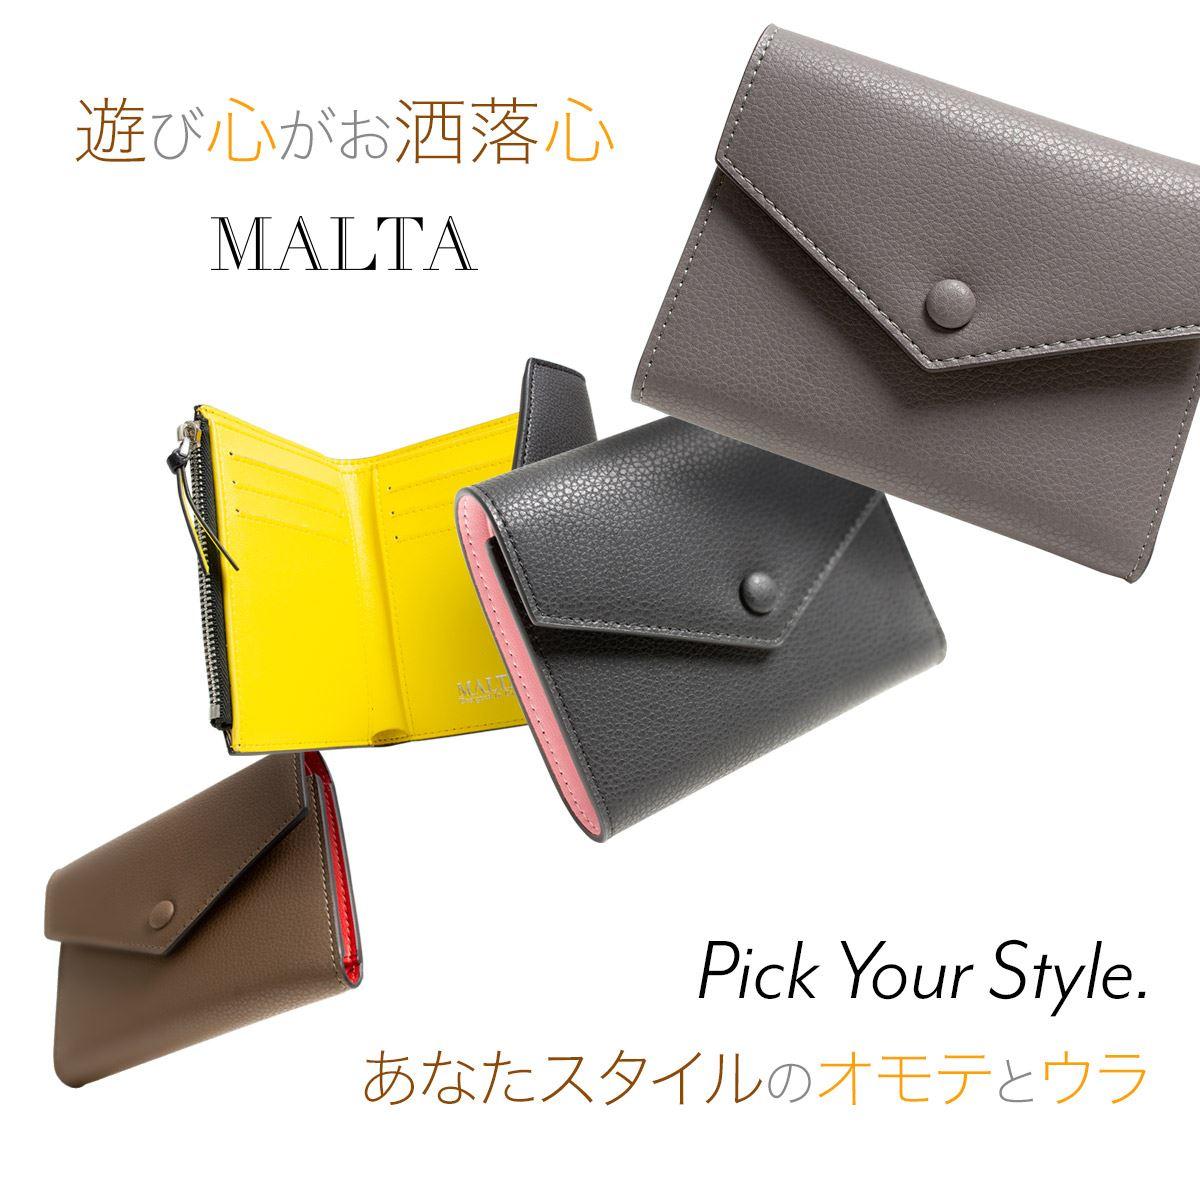 MALTAフラップ二つ折り財布